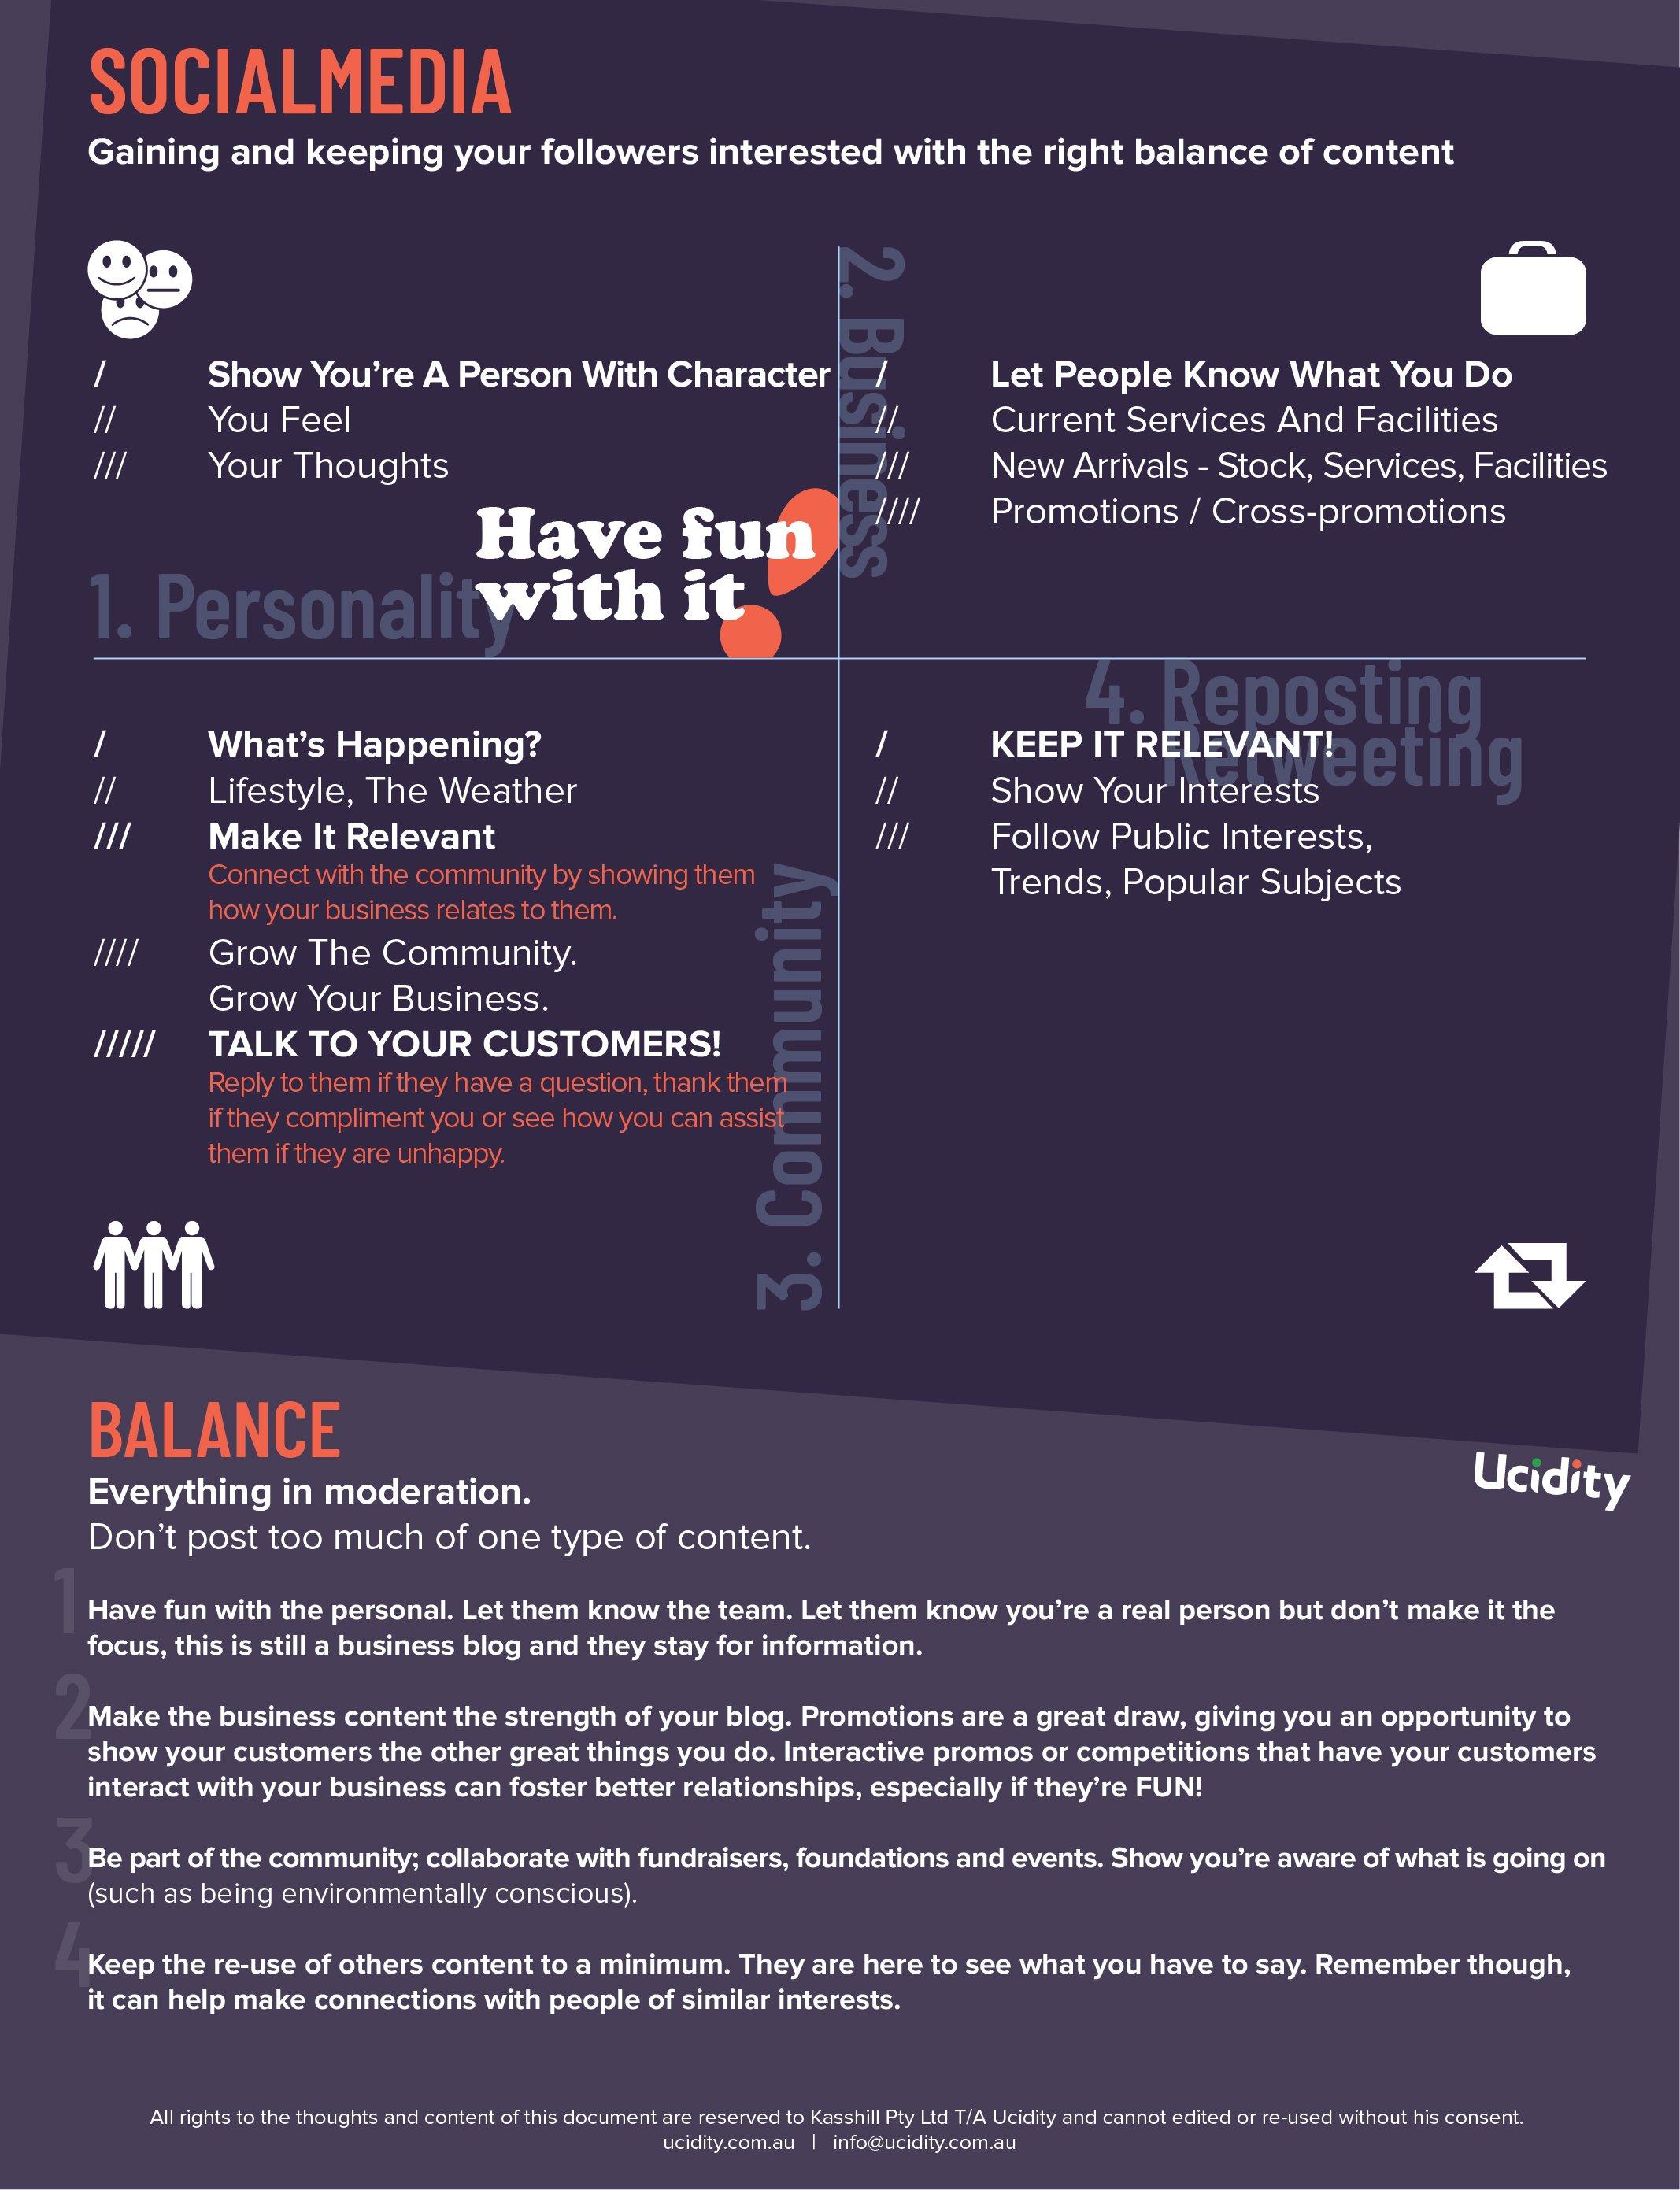 Ucidity - Social Balance - Infographic (20210304-v01)-01